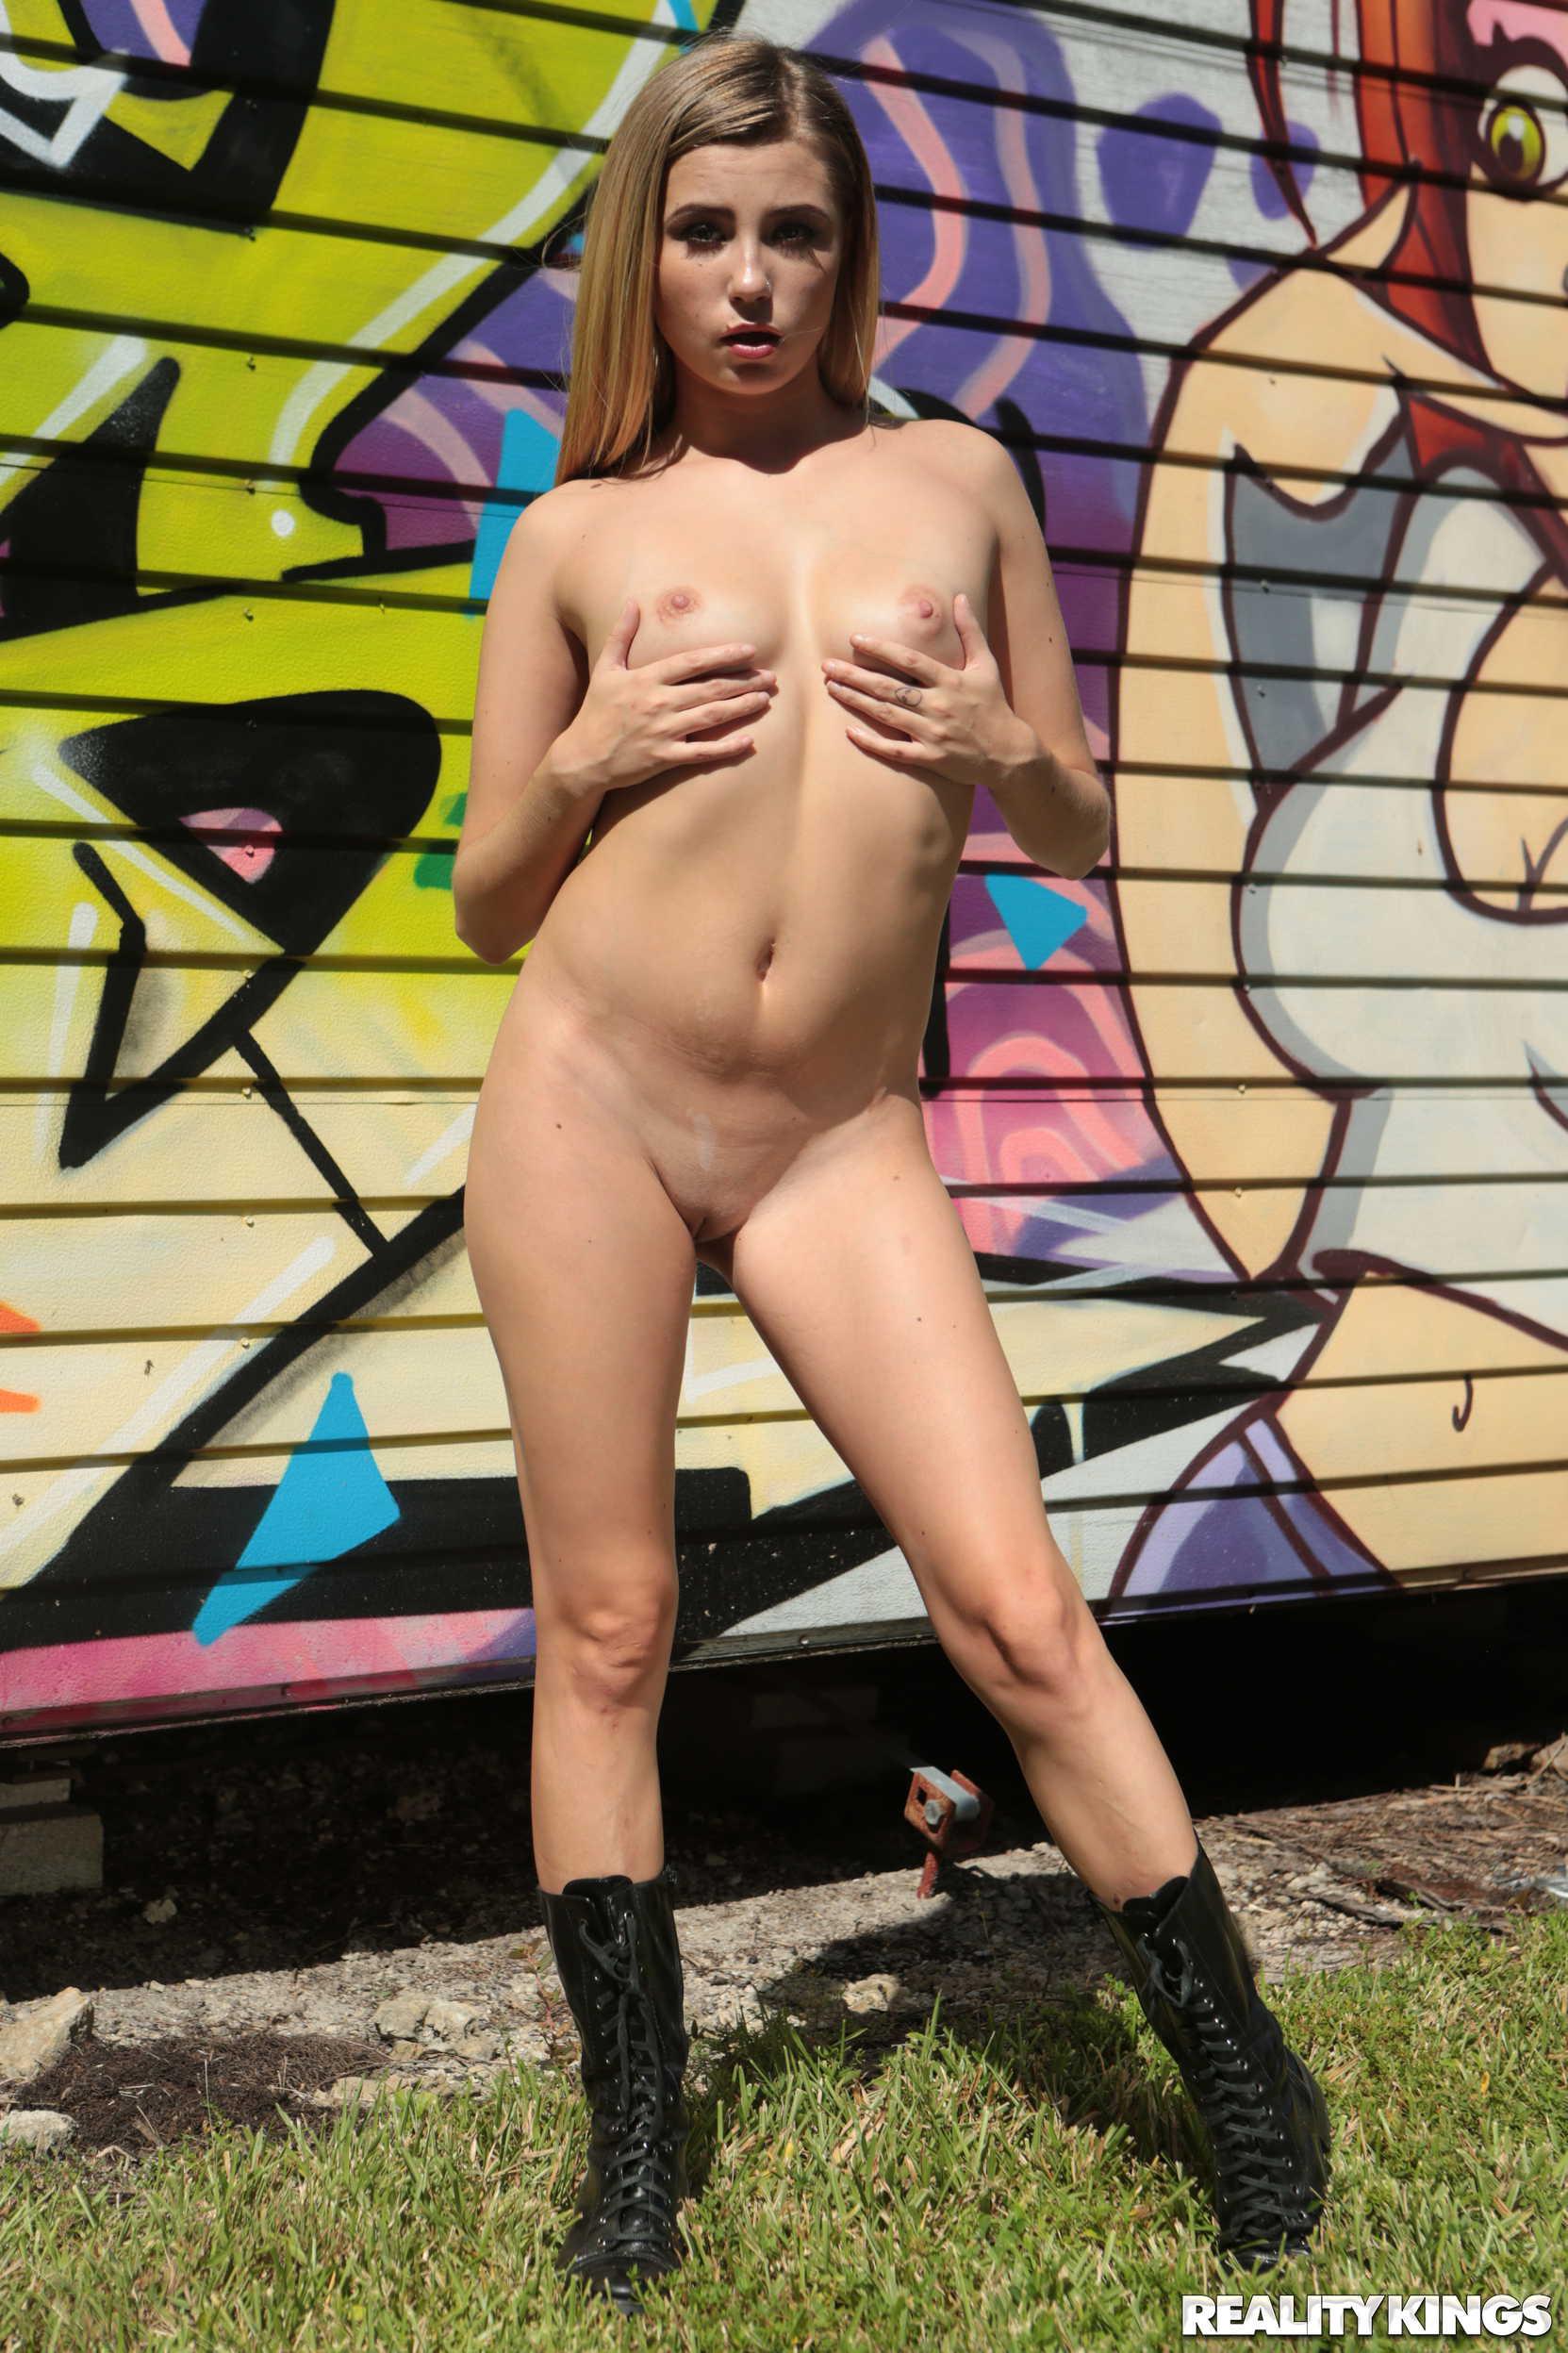 Reality Kings 'Spray And Play' starring Carolina Sweets (Photo 18)